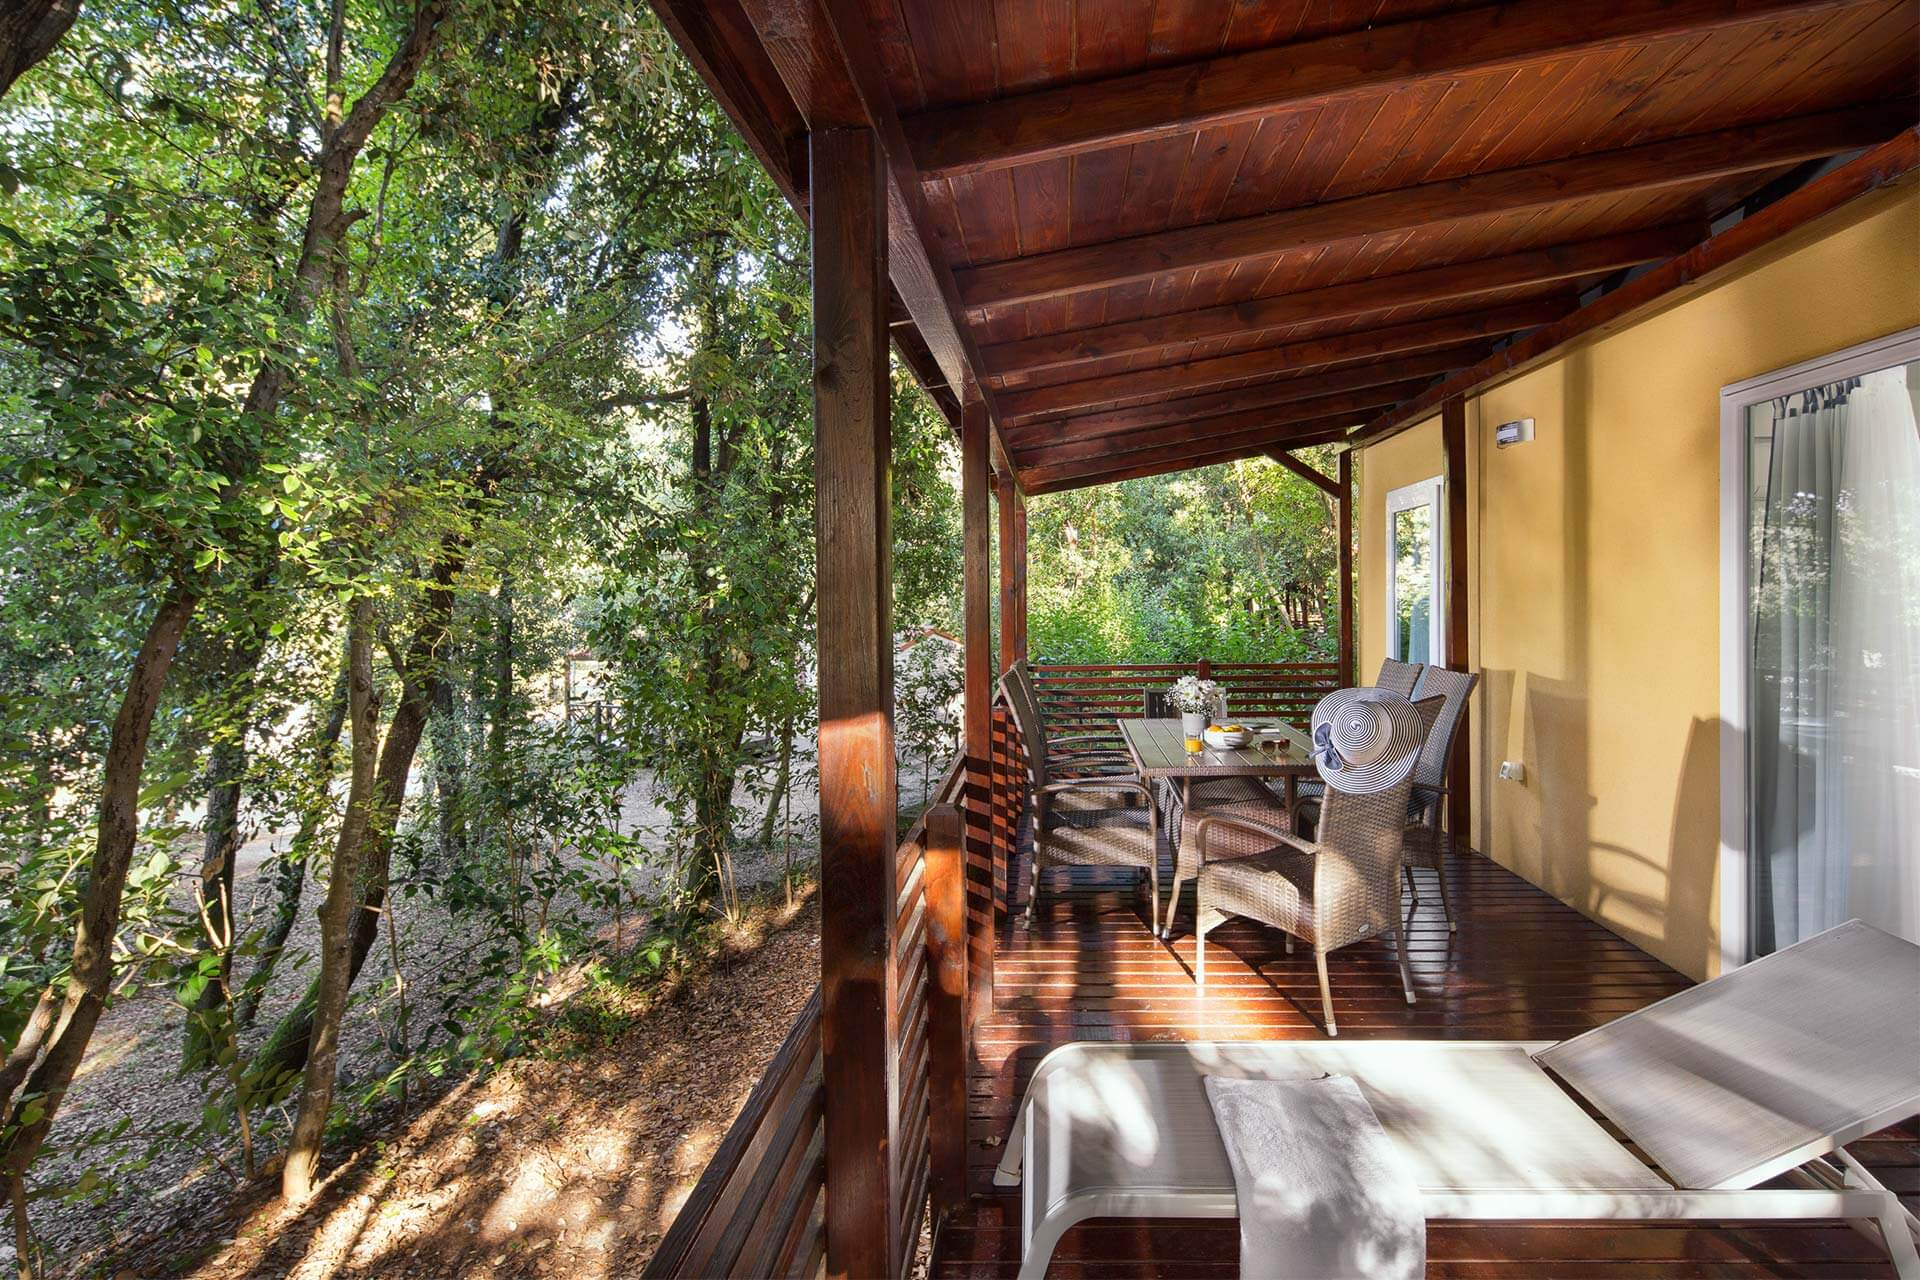 Comfort Plus Camping Home